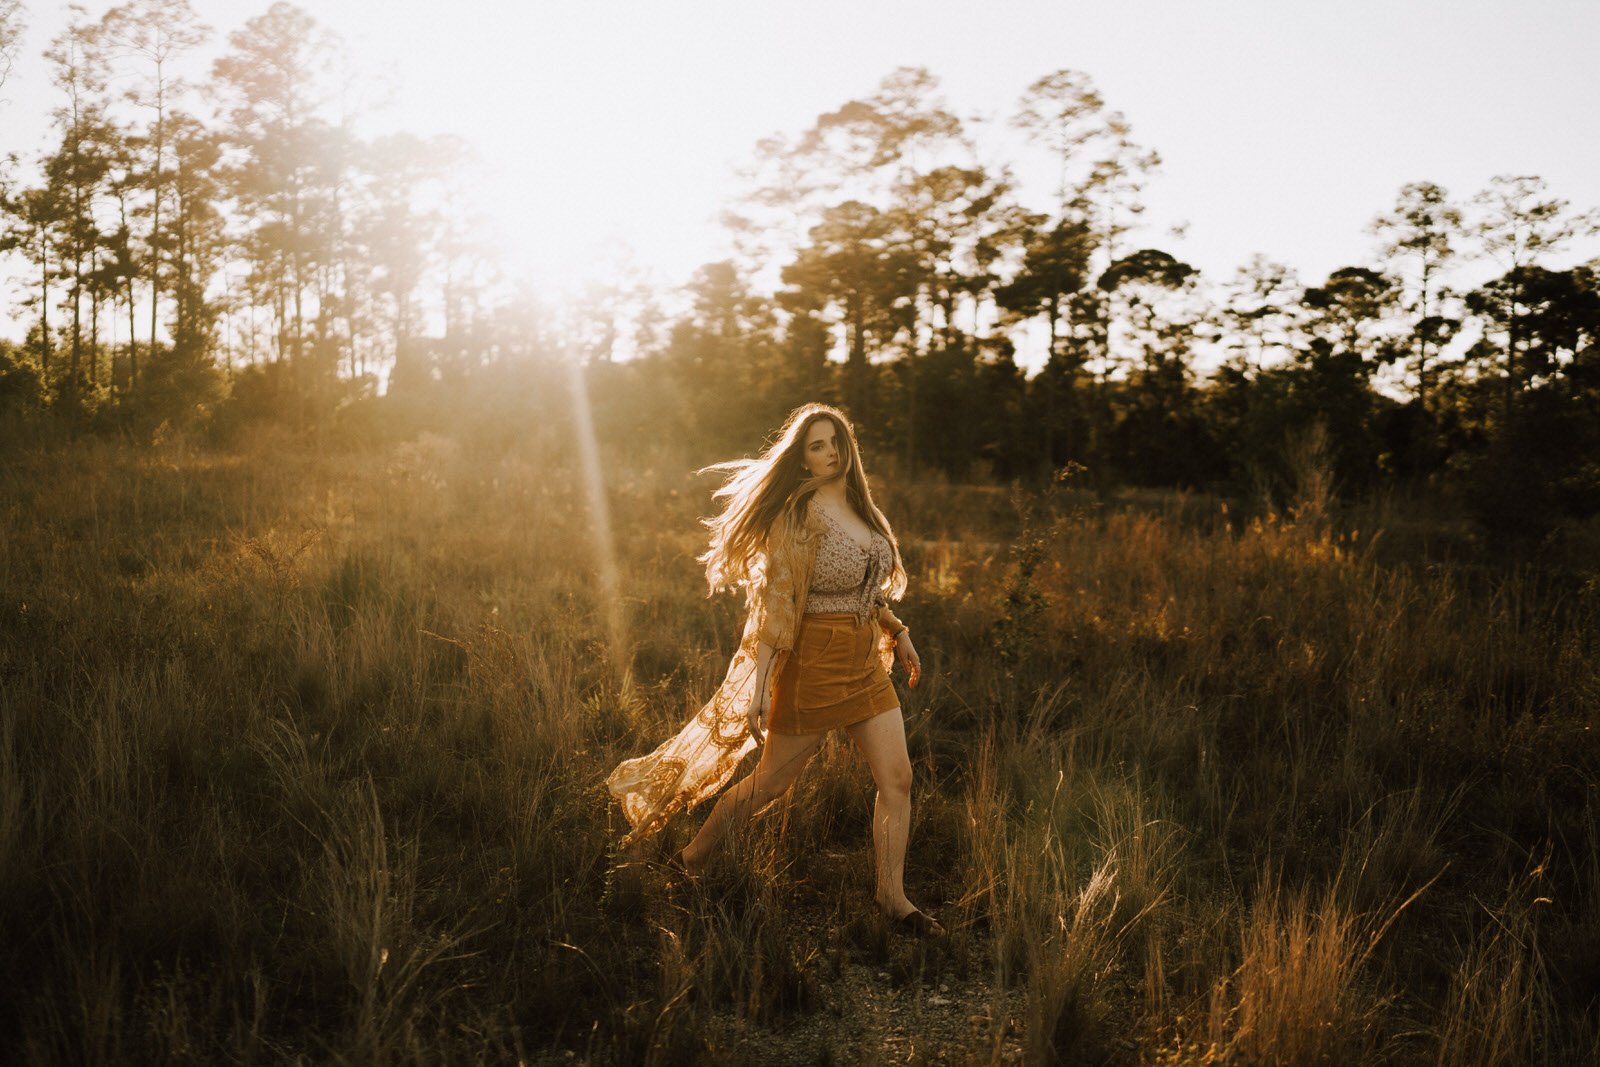 Fort Myers Senior Photos on a Field - Michelle Gonzalez Photography - Stephanie Blum-91.JPG